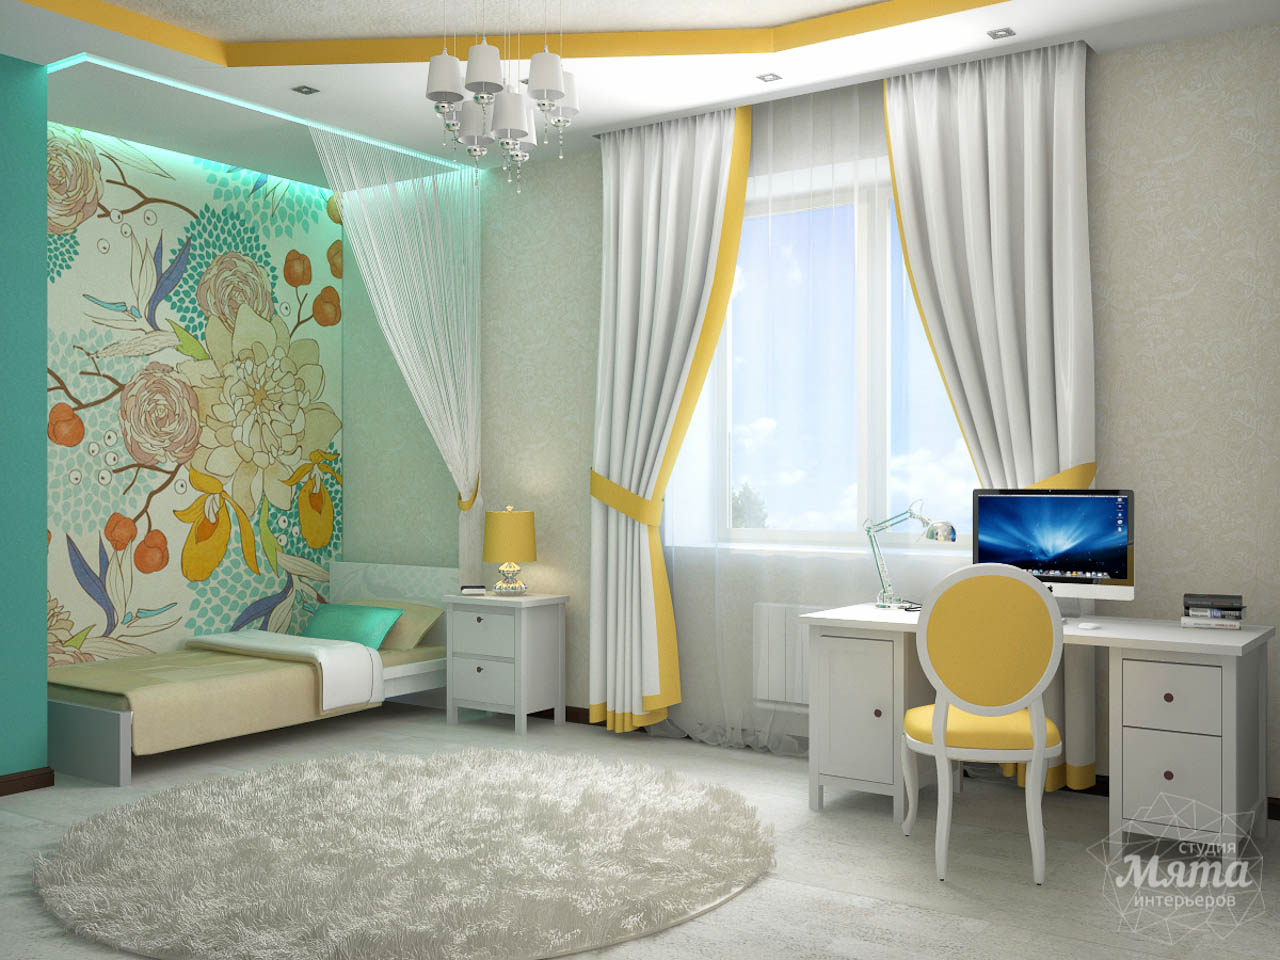 Дизайн проект интерьера коттеджа  в стиле минимализм по ул. Барвинка 15 img766958463